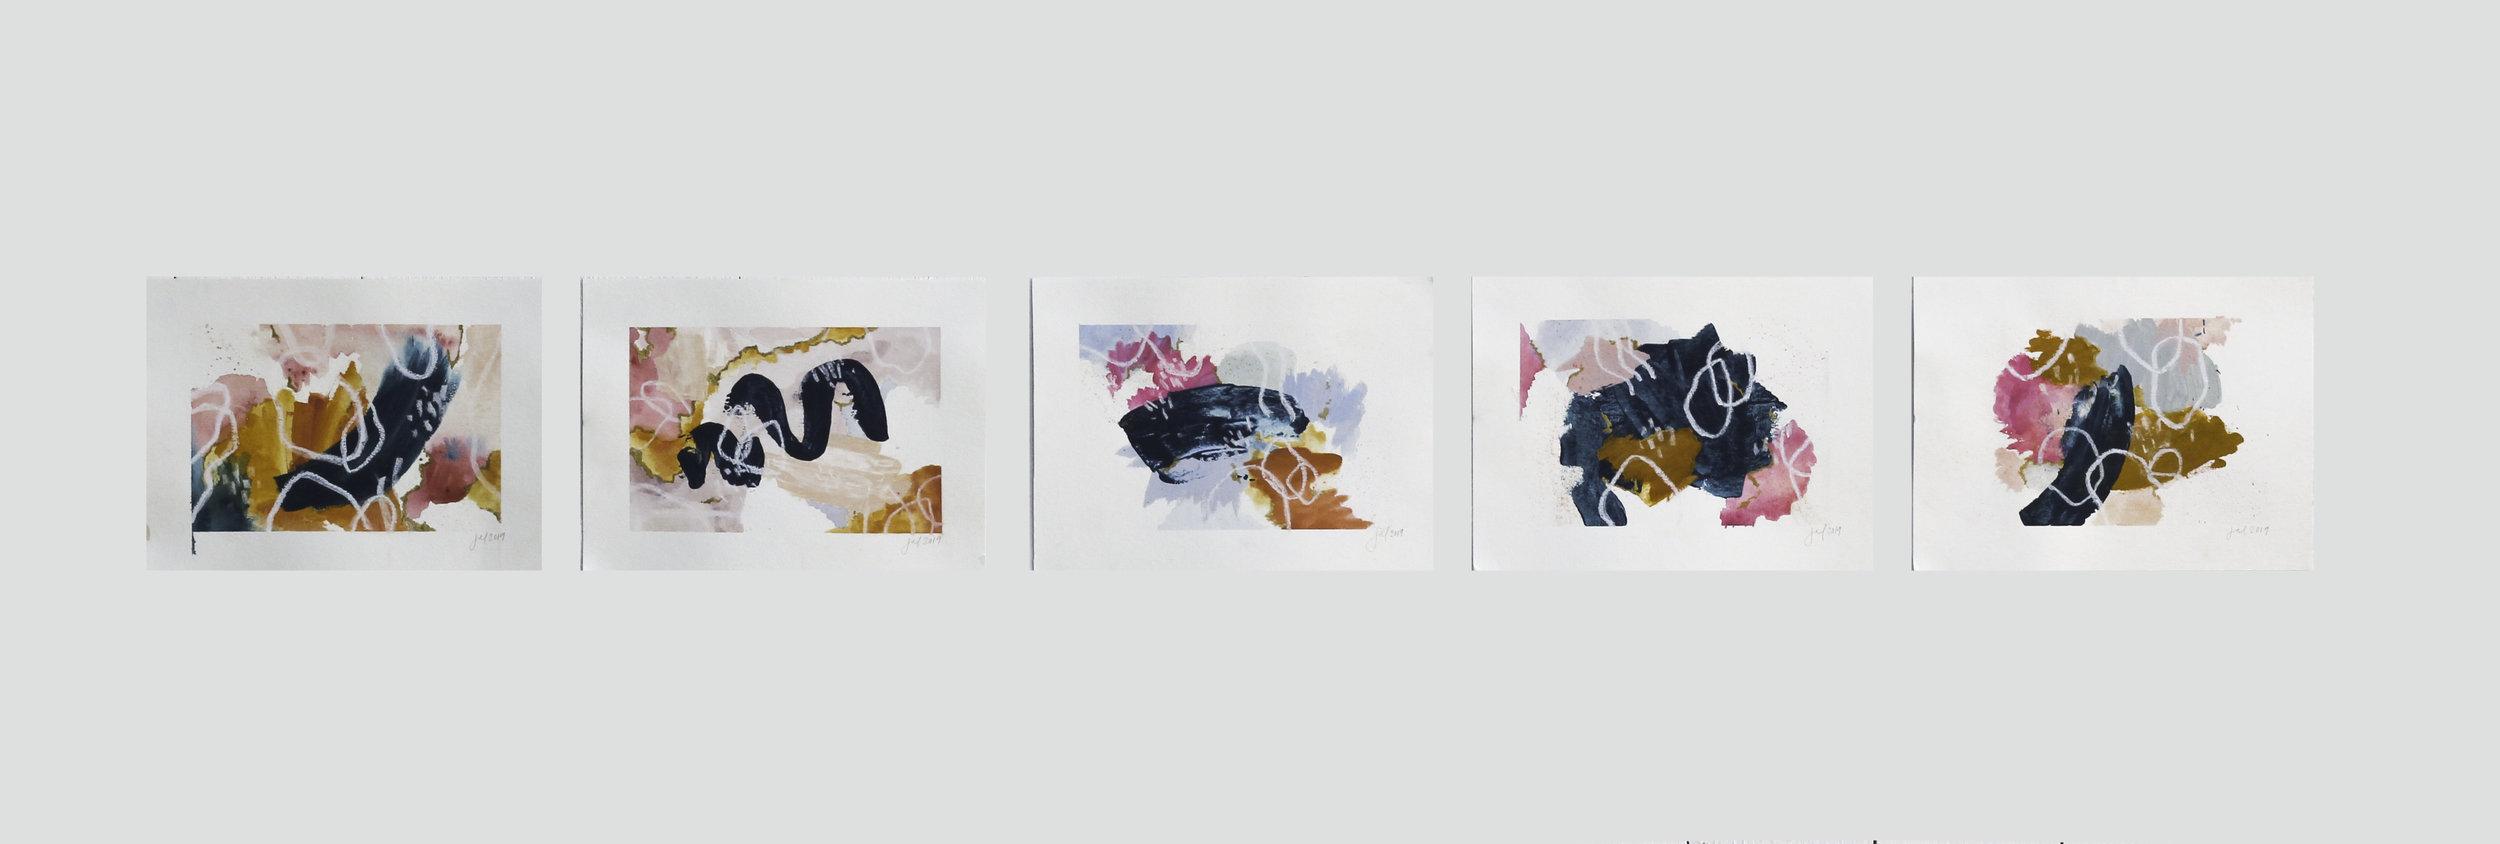 auras NO. 1 - 8 x 10 each | Acrylic, watercolor, pastel on paper |June 2019.